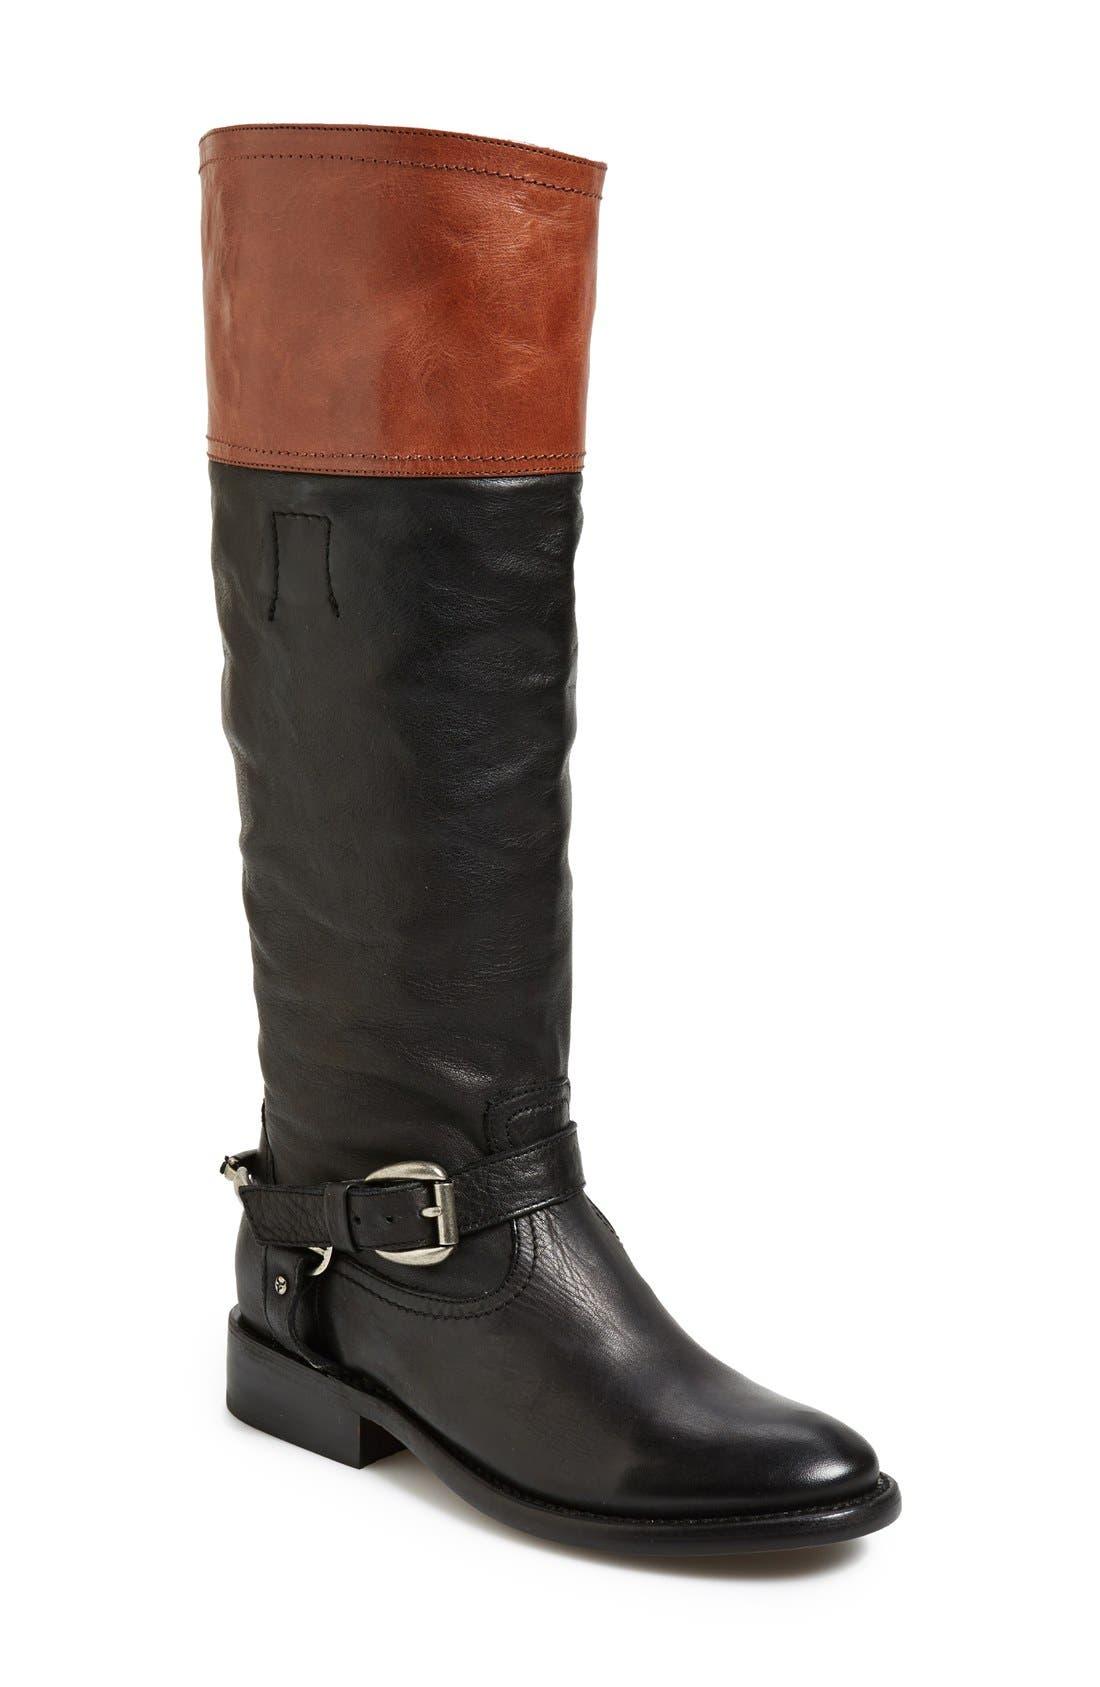 Main Image - Trask 'Addison' Riding Boot (Women)